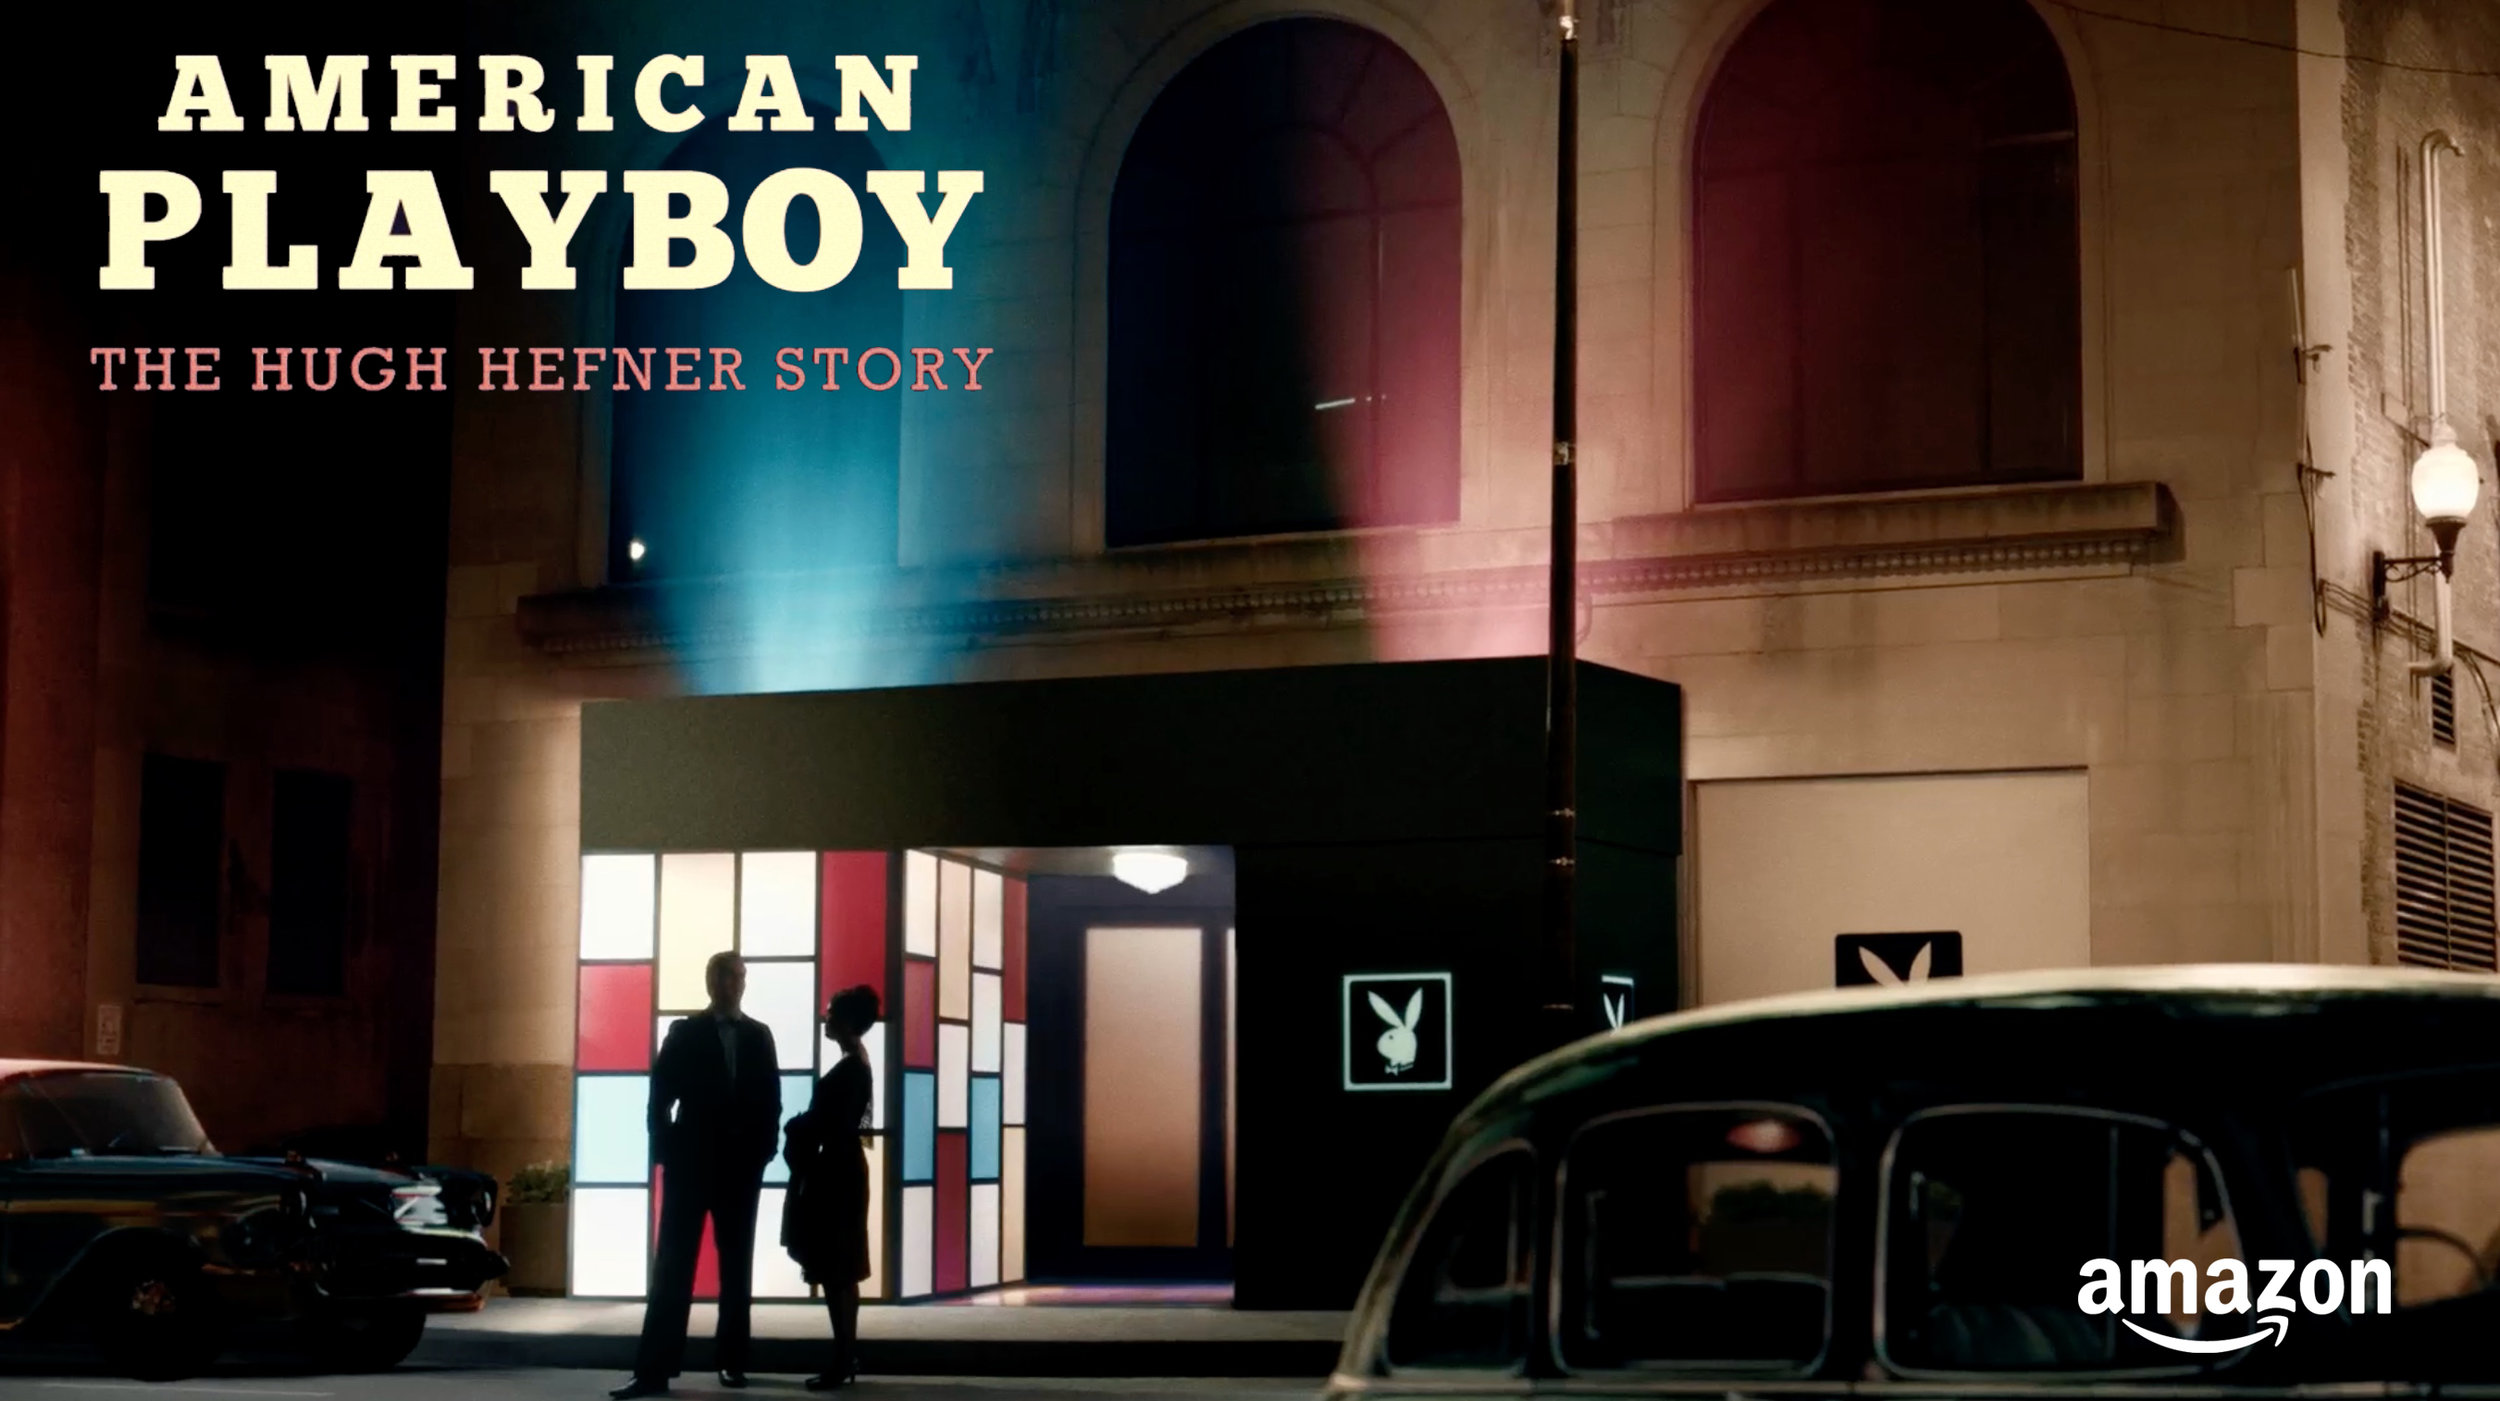 American-Playboy-poster.jpg